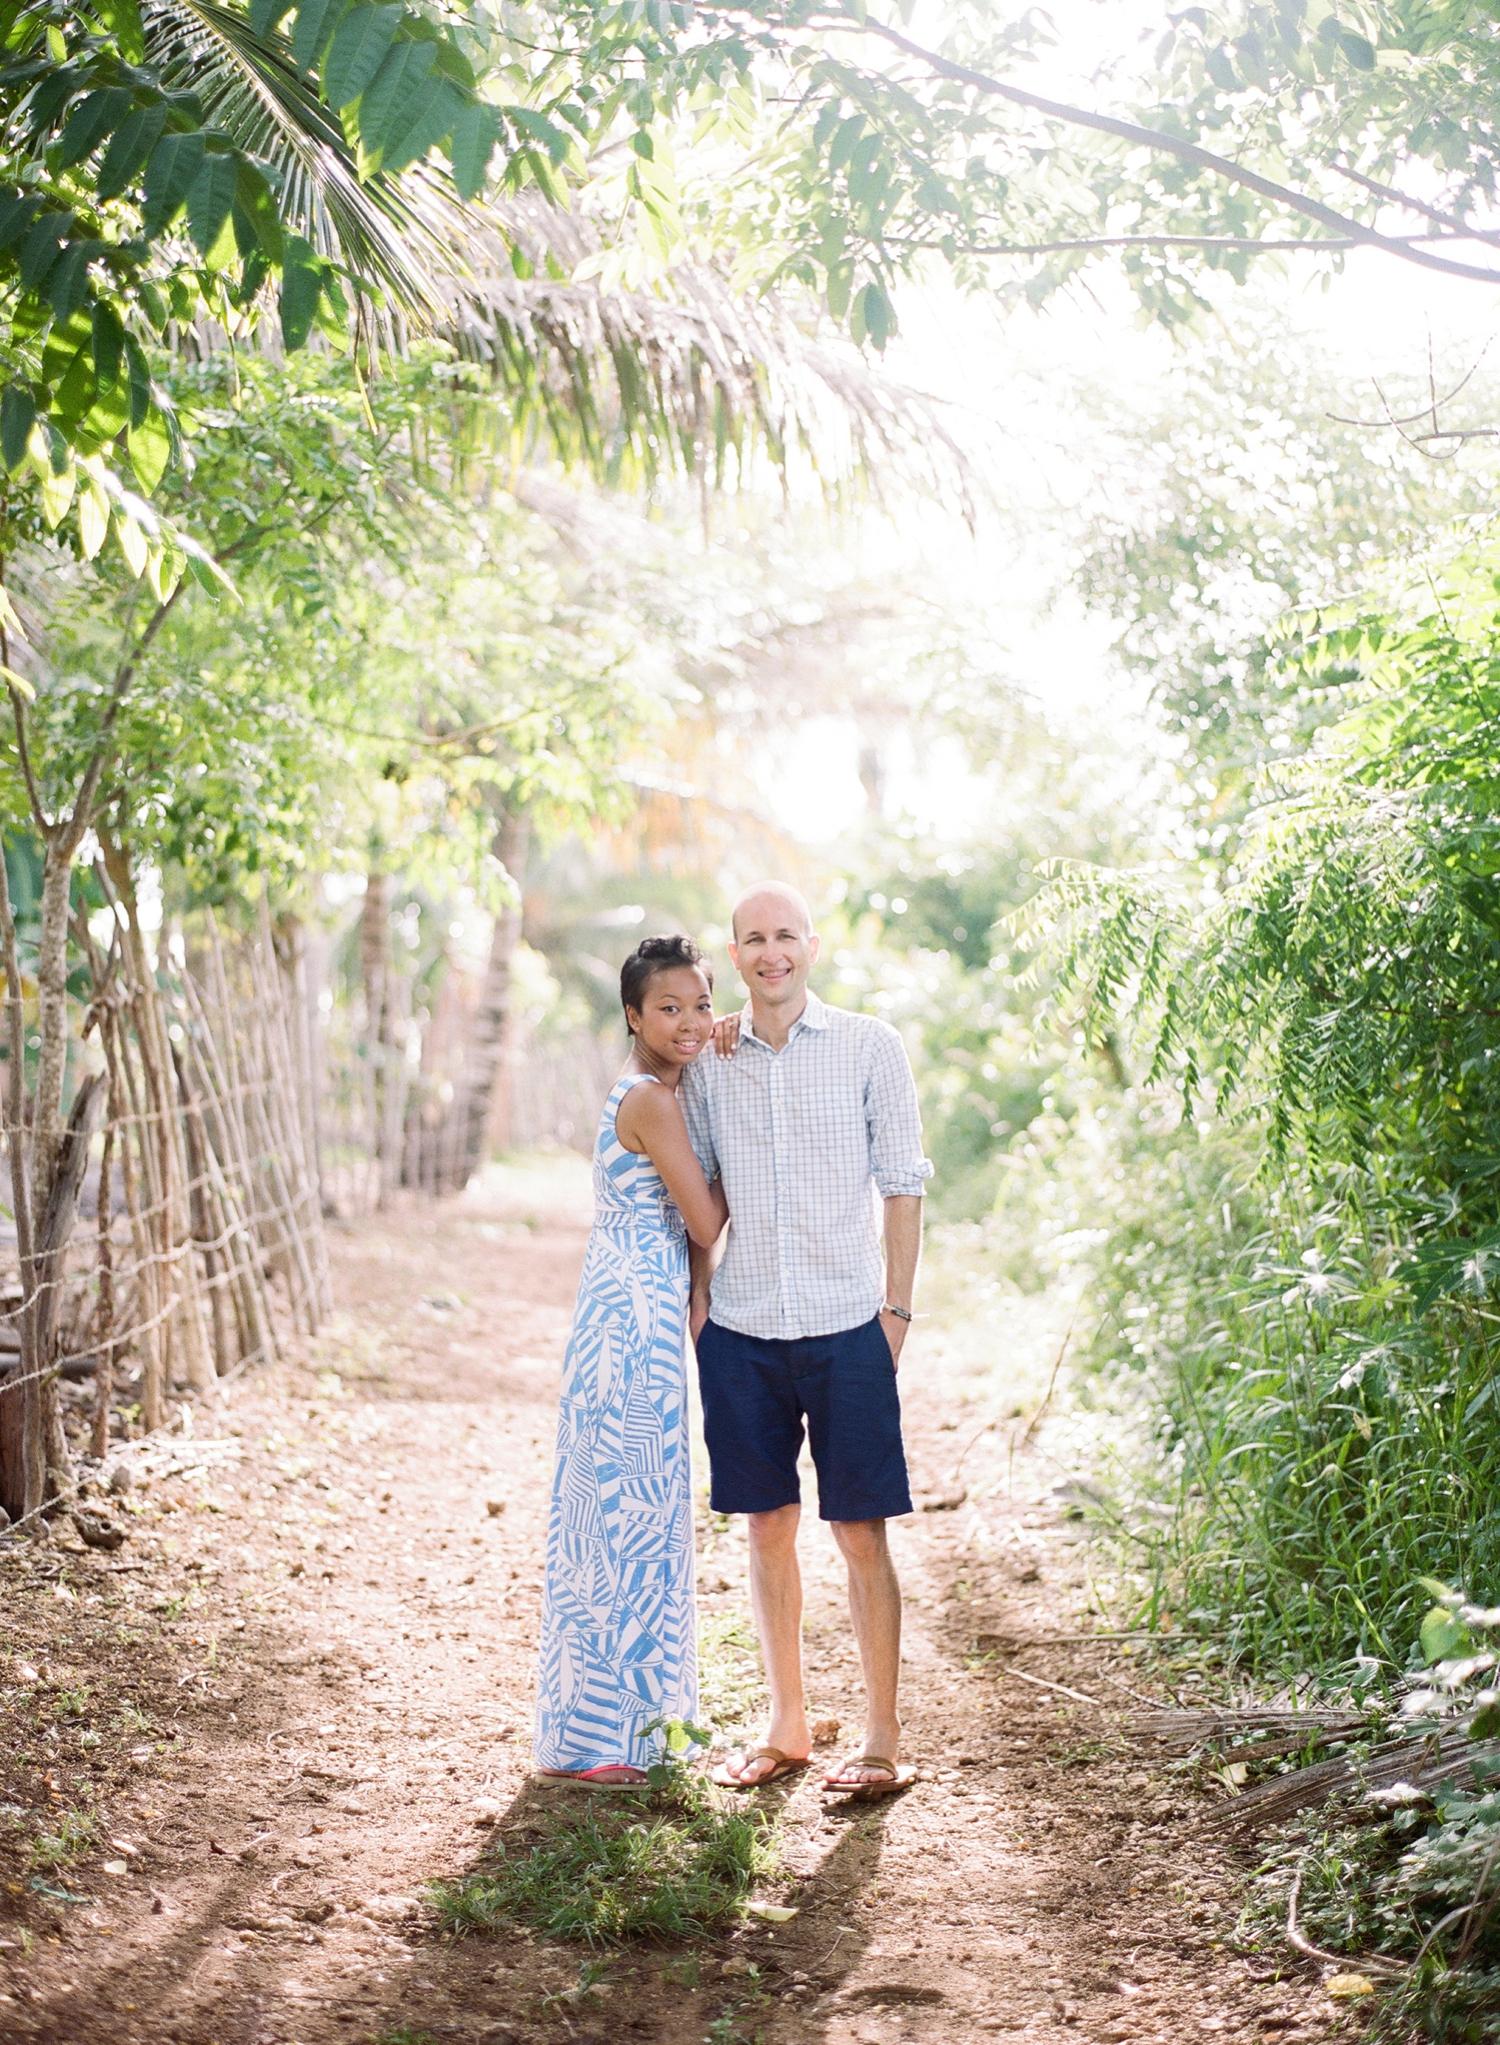 destination wedding photographer in punta cana, dominican republic